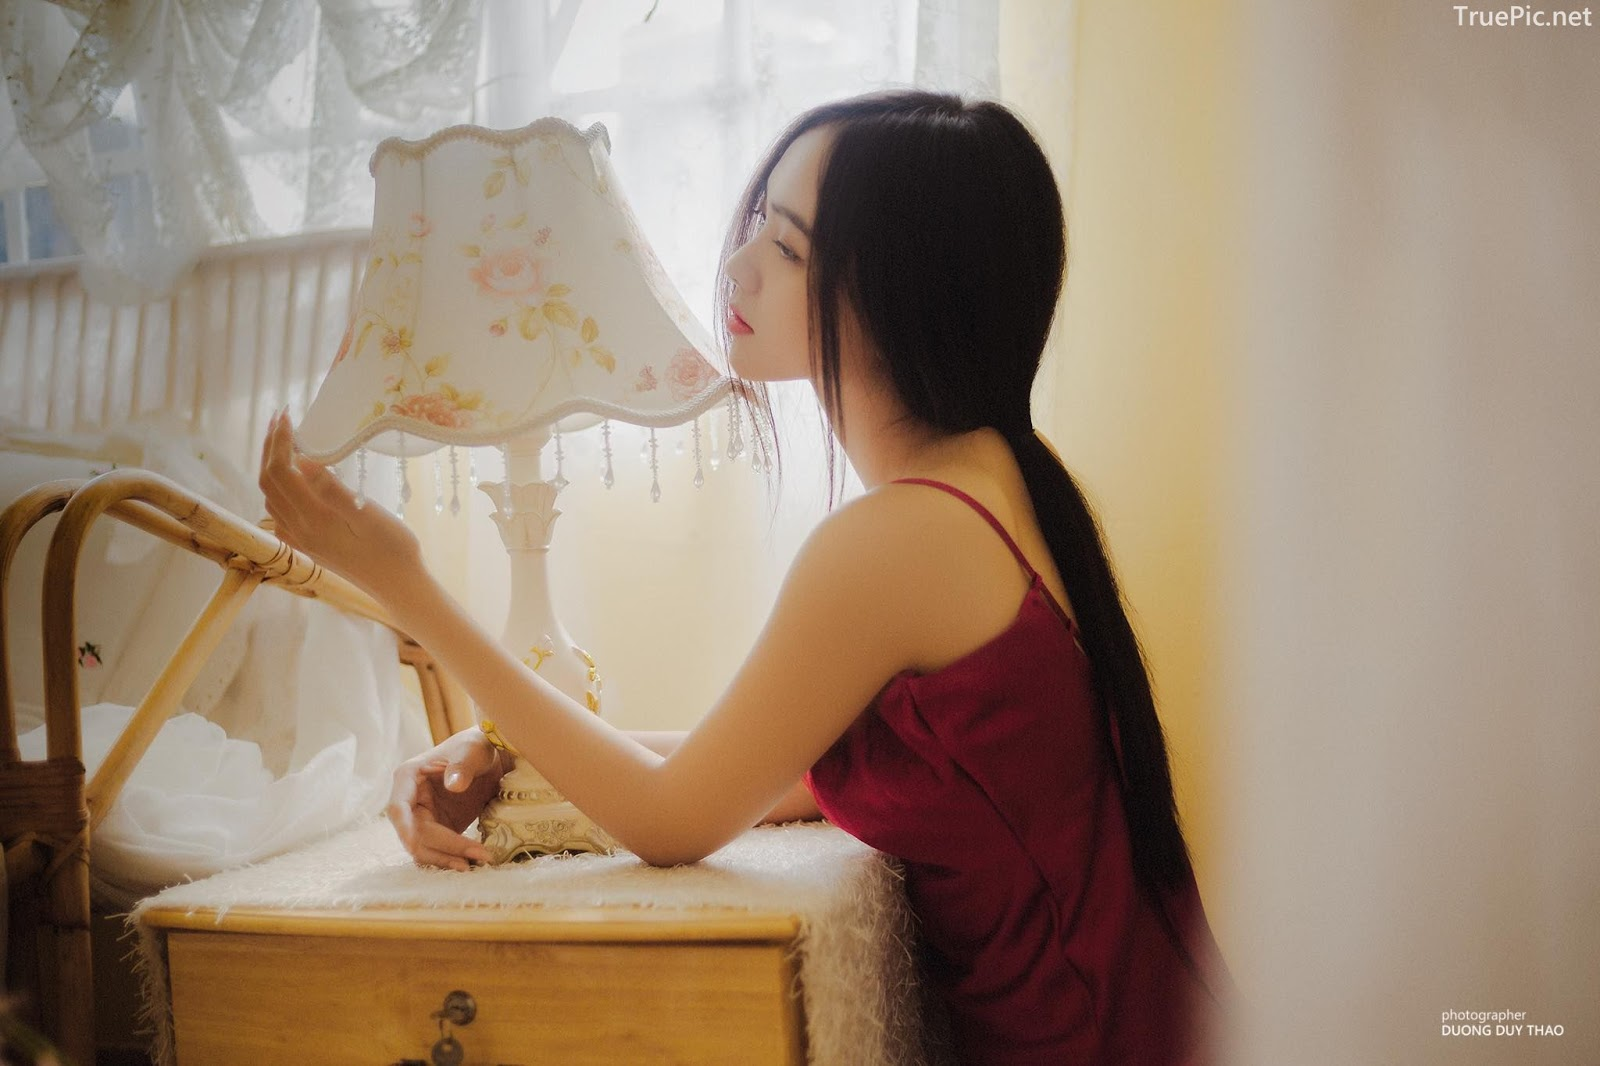 Vietnamese hot girl model Hua Thao Nguyen - She is a beautiful butterfly - Picture 7